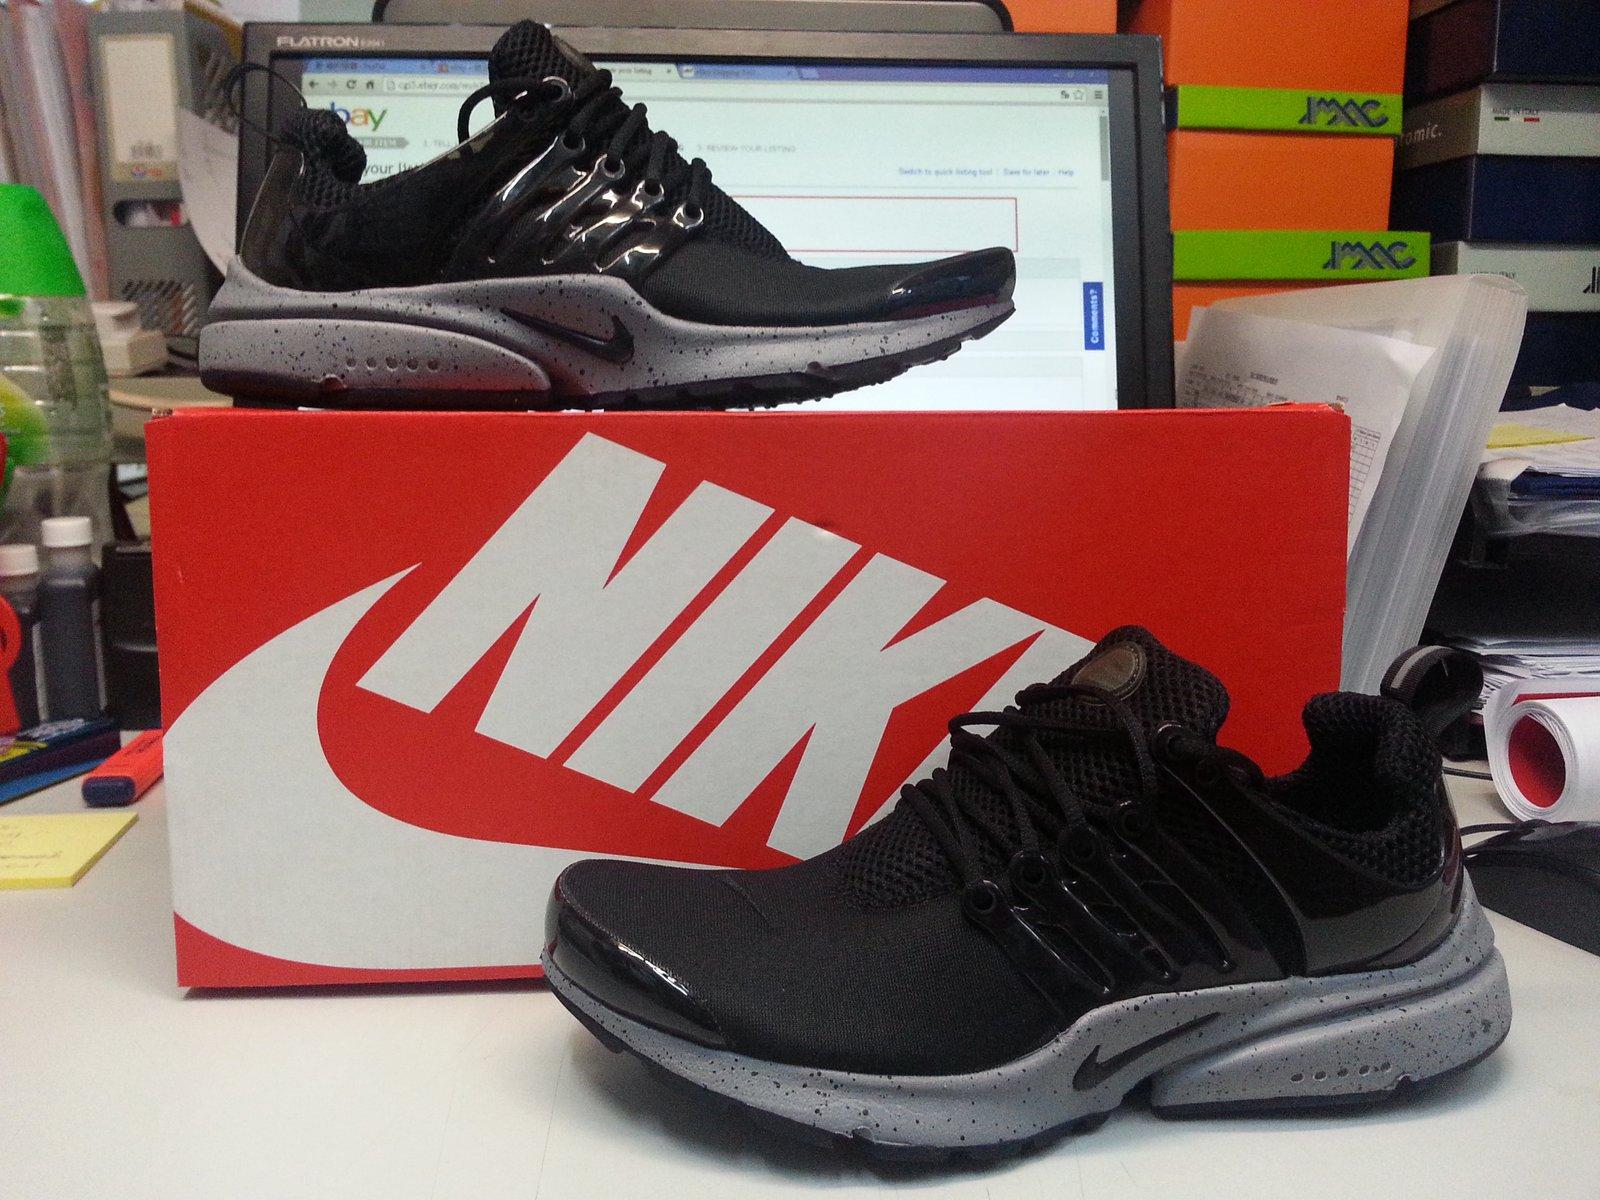 Nike Presto SP Genealogy of Free Pack